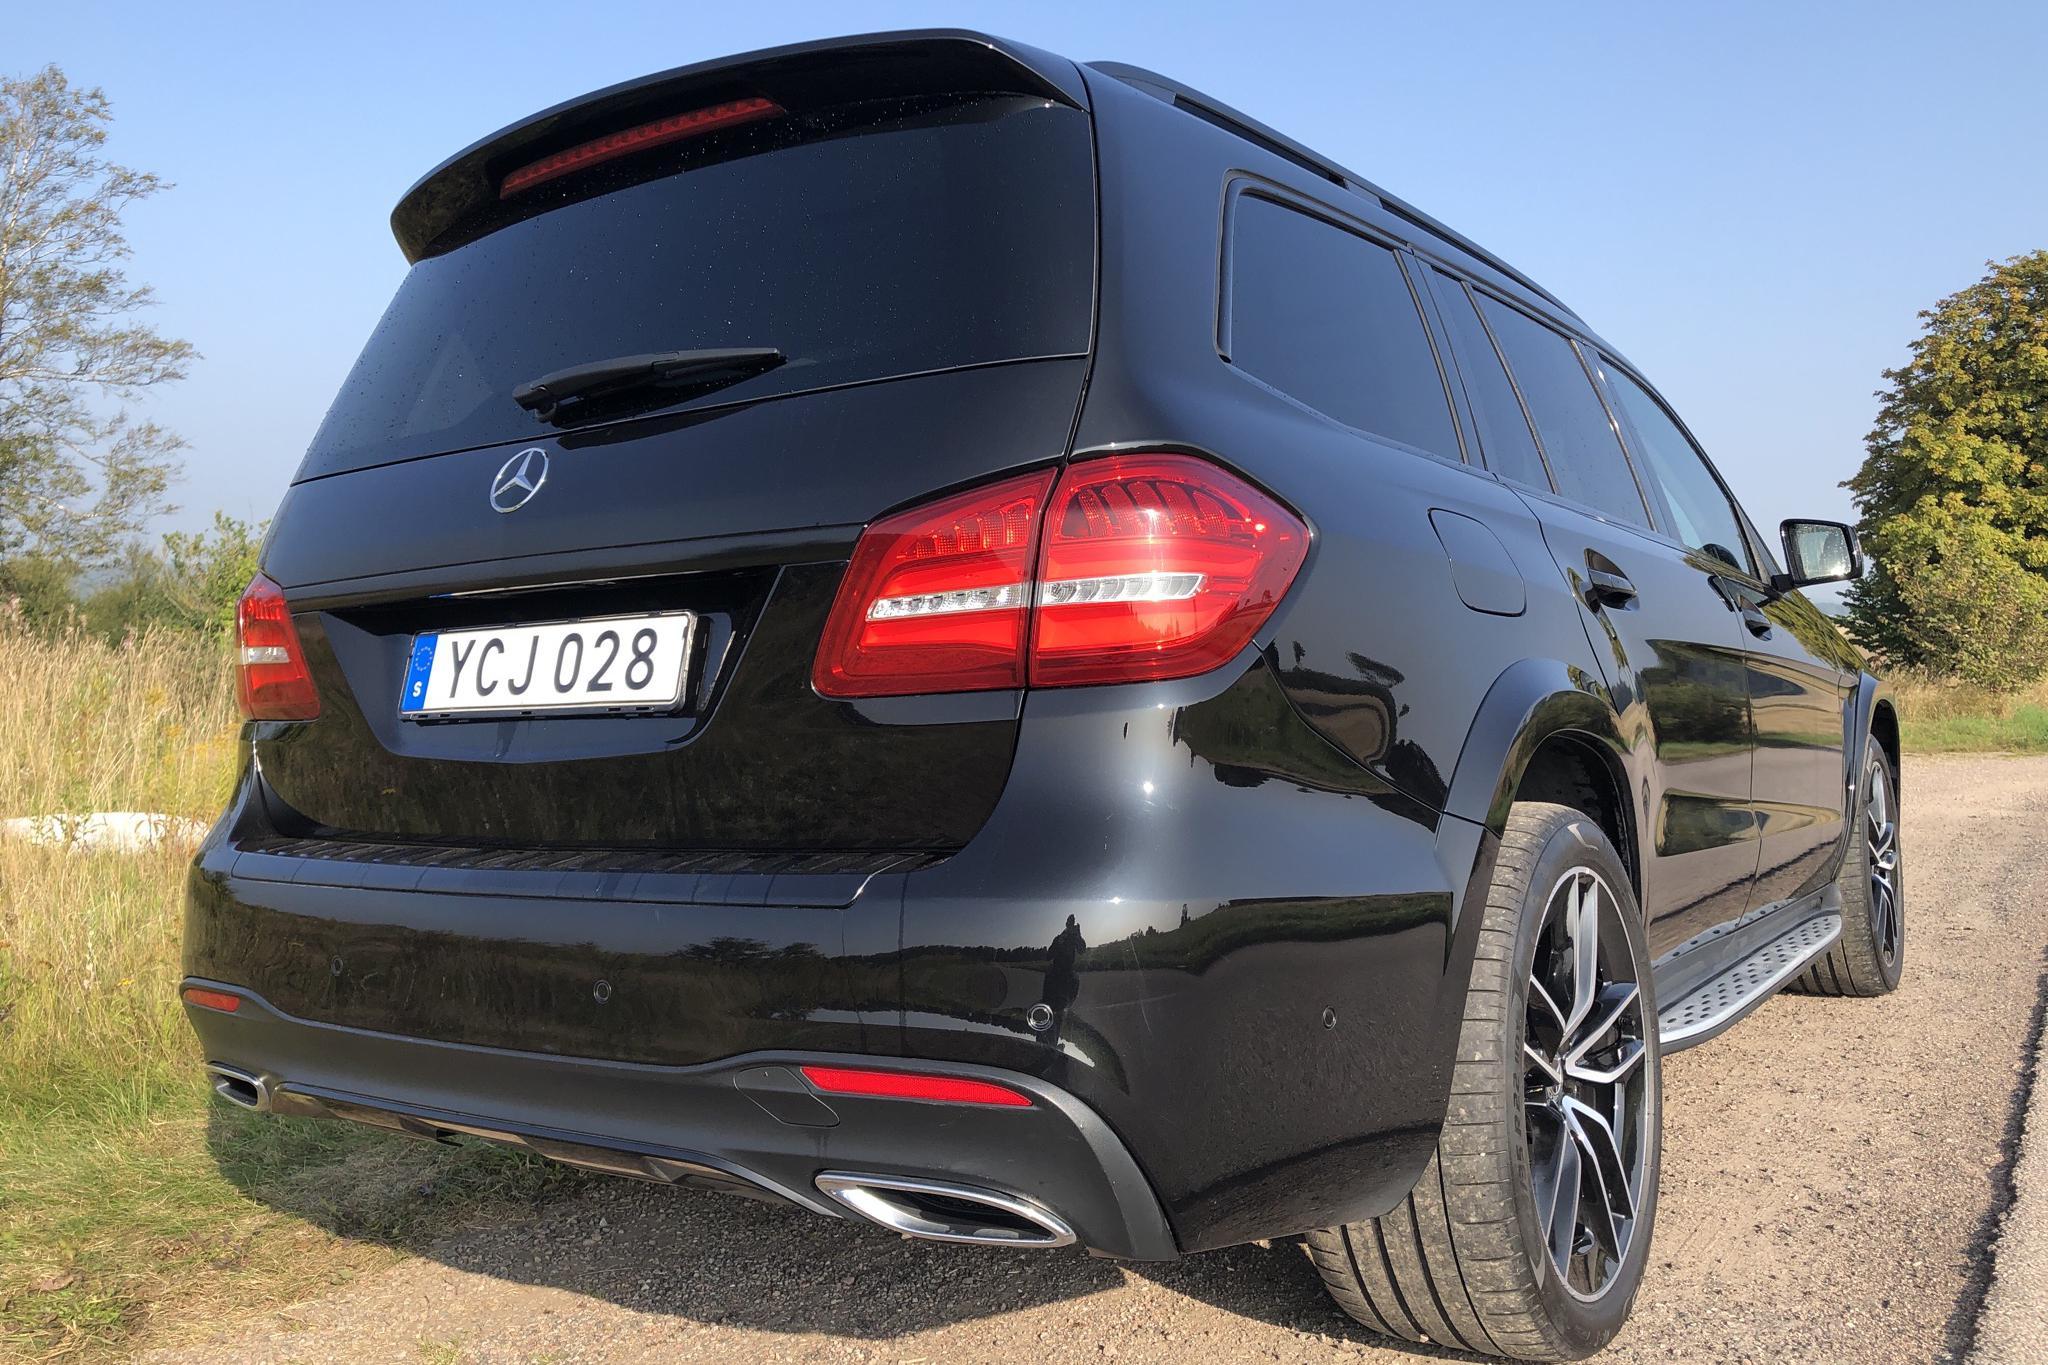 Mercedes GLS 350 d 4MATIC X166 (258hk) - 93 350 km - Automatic - black - 2016